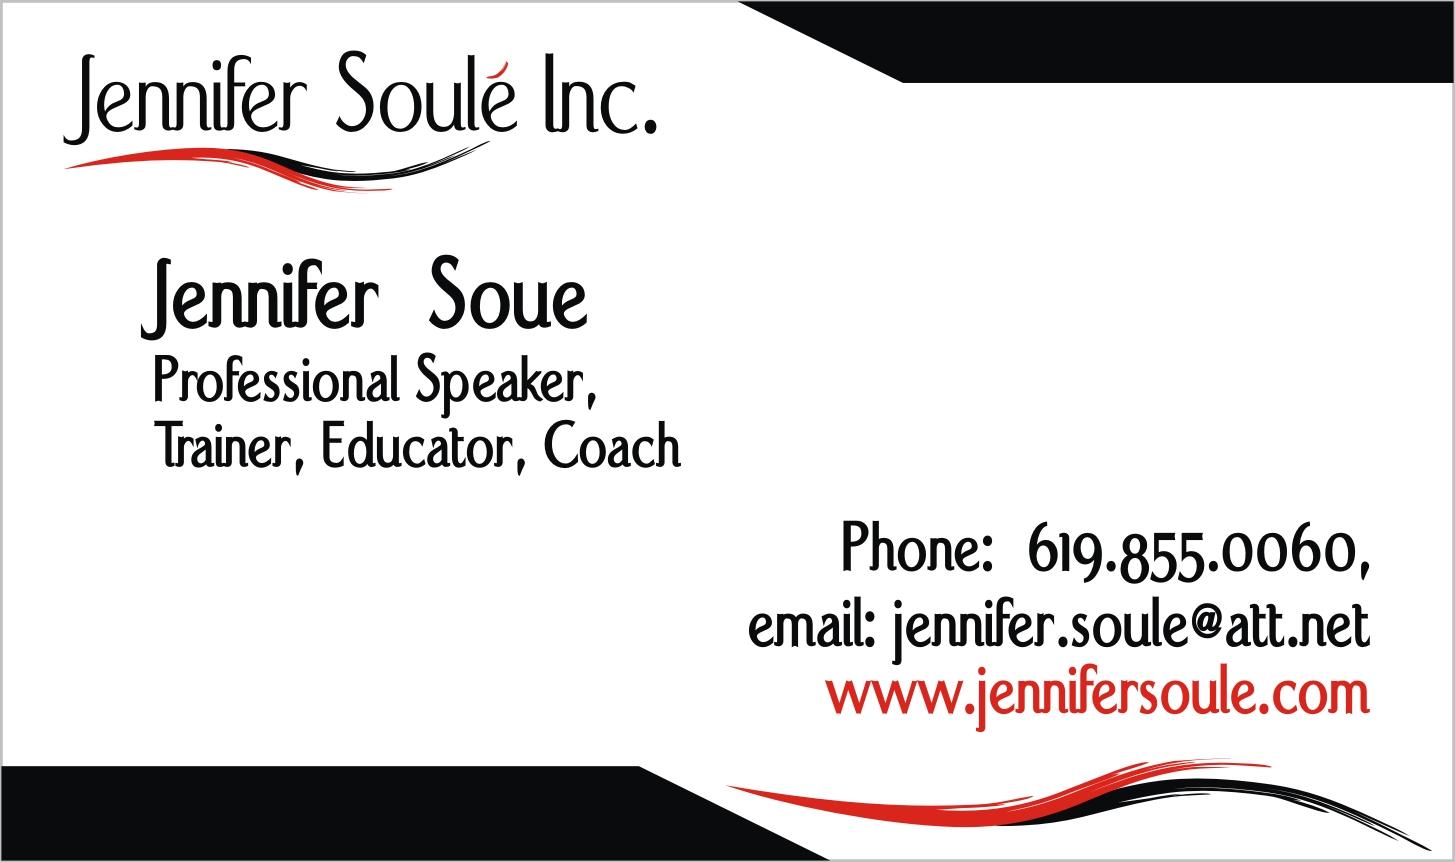 Jennifer Soule Corporate Identity